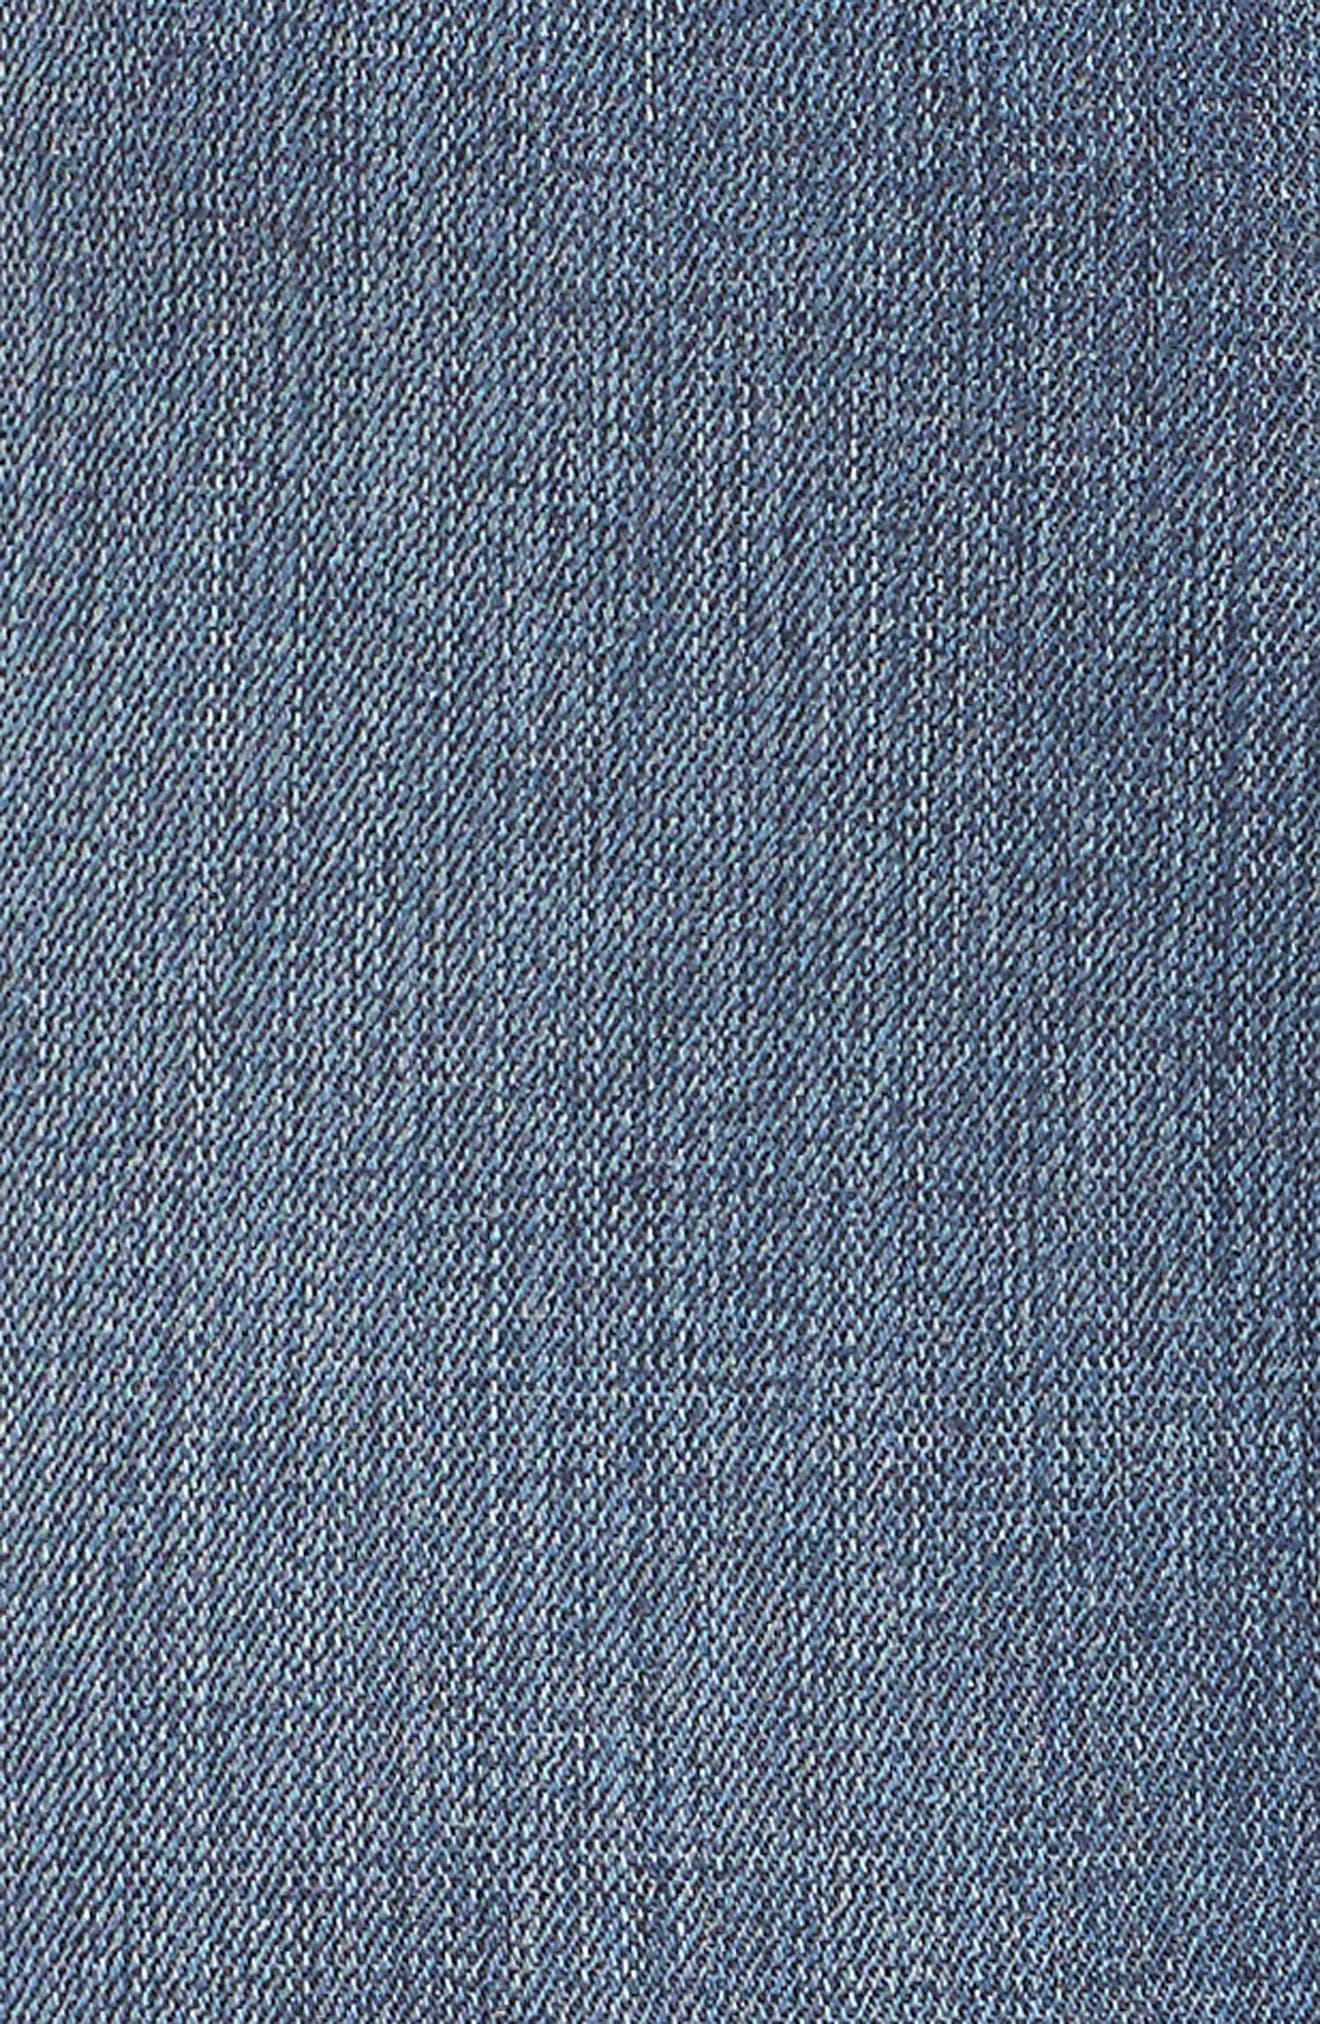 High Waist Denim Pencil Skirt,                             Alternate thumbnail 6, color,                             Blue 083